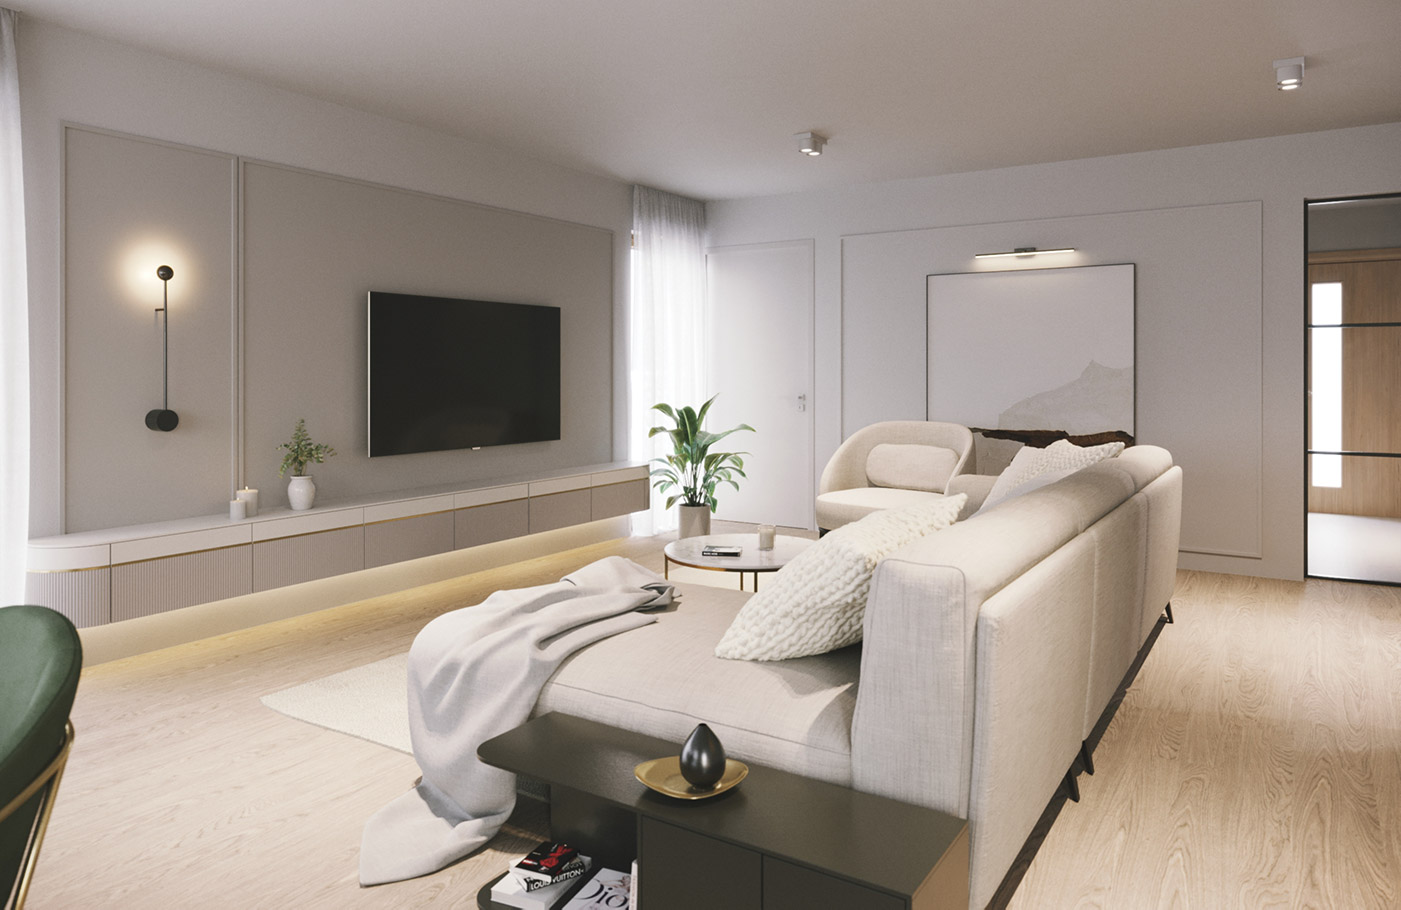 Cloud Haven, House interior design